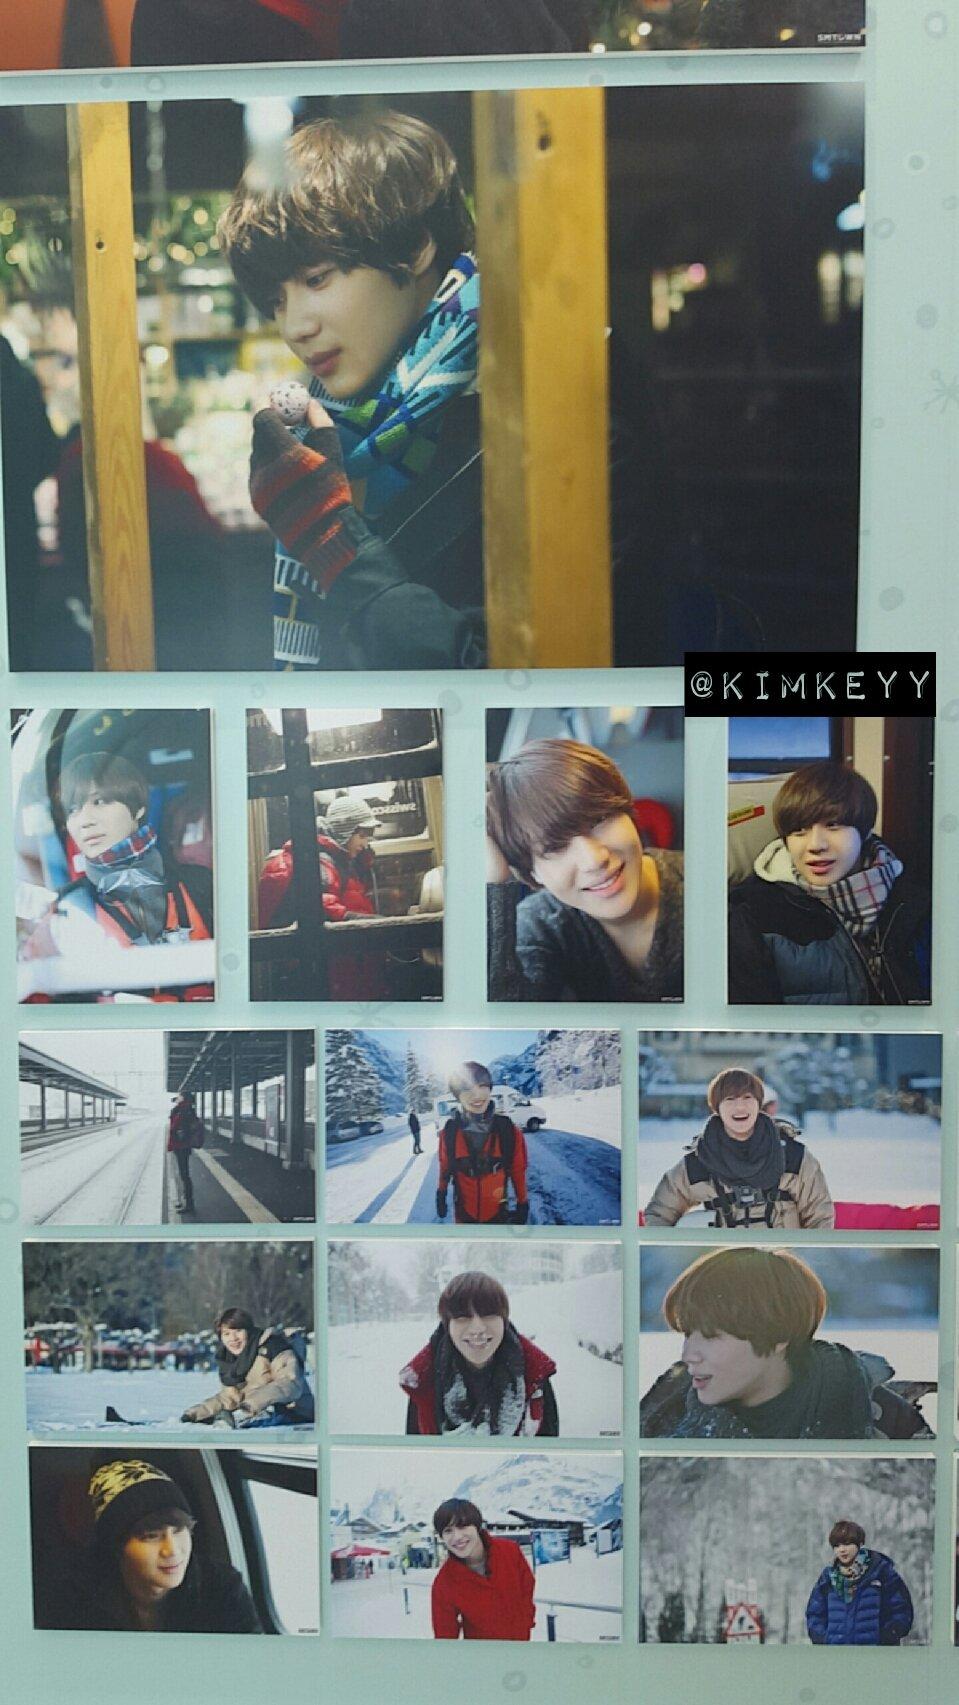 SHINee @ SHINee Surprise Vacation Exhibition 25192642152_21a1bd6f26_o